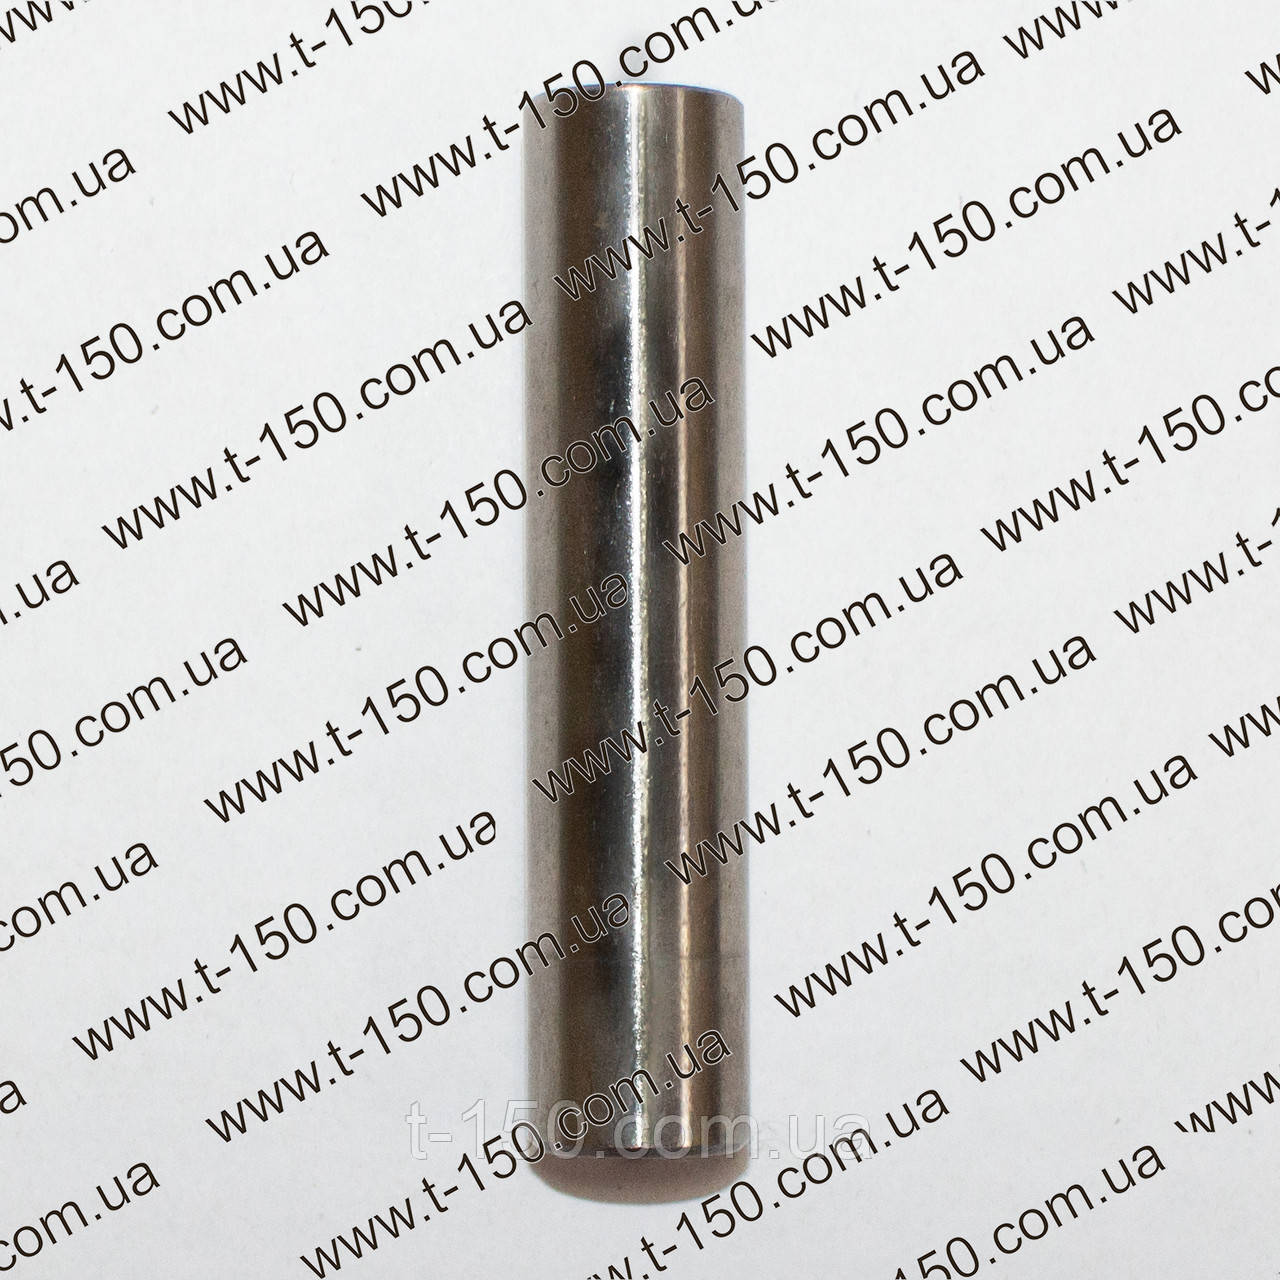 Втулка направляющего клапана Д-65, Д-240 (50-1007032)